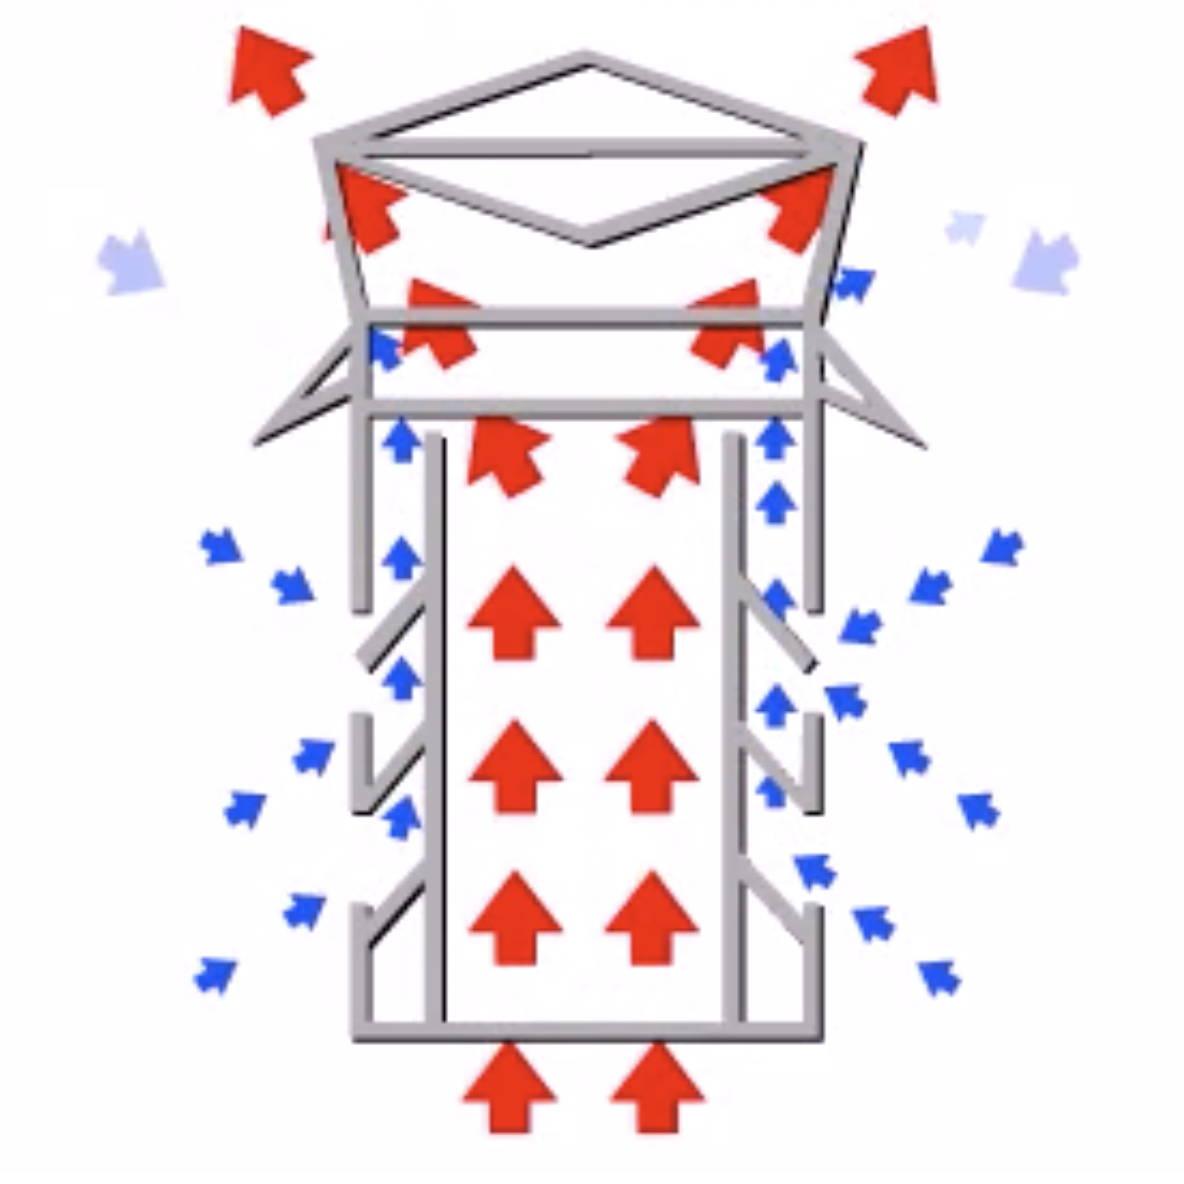 cowl suction diagram